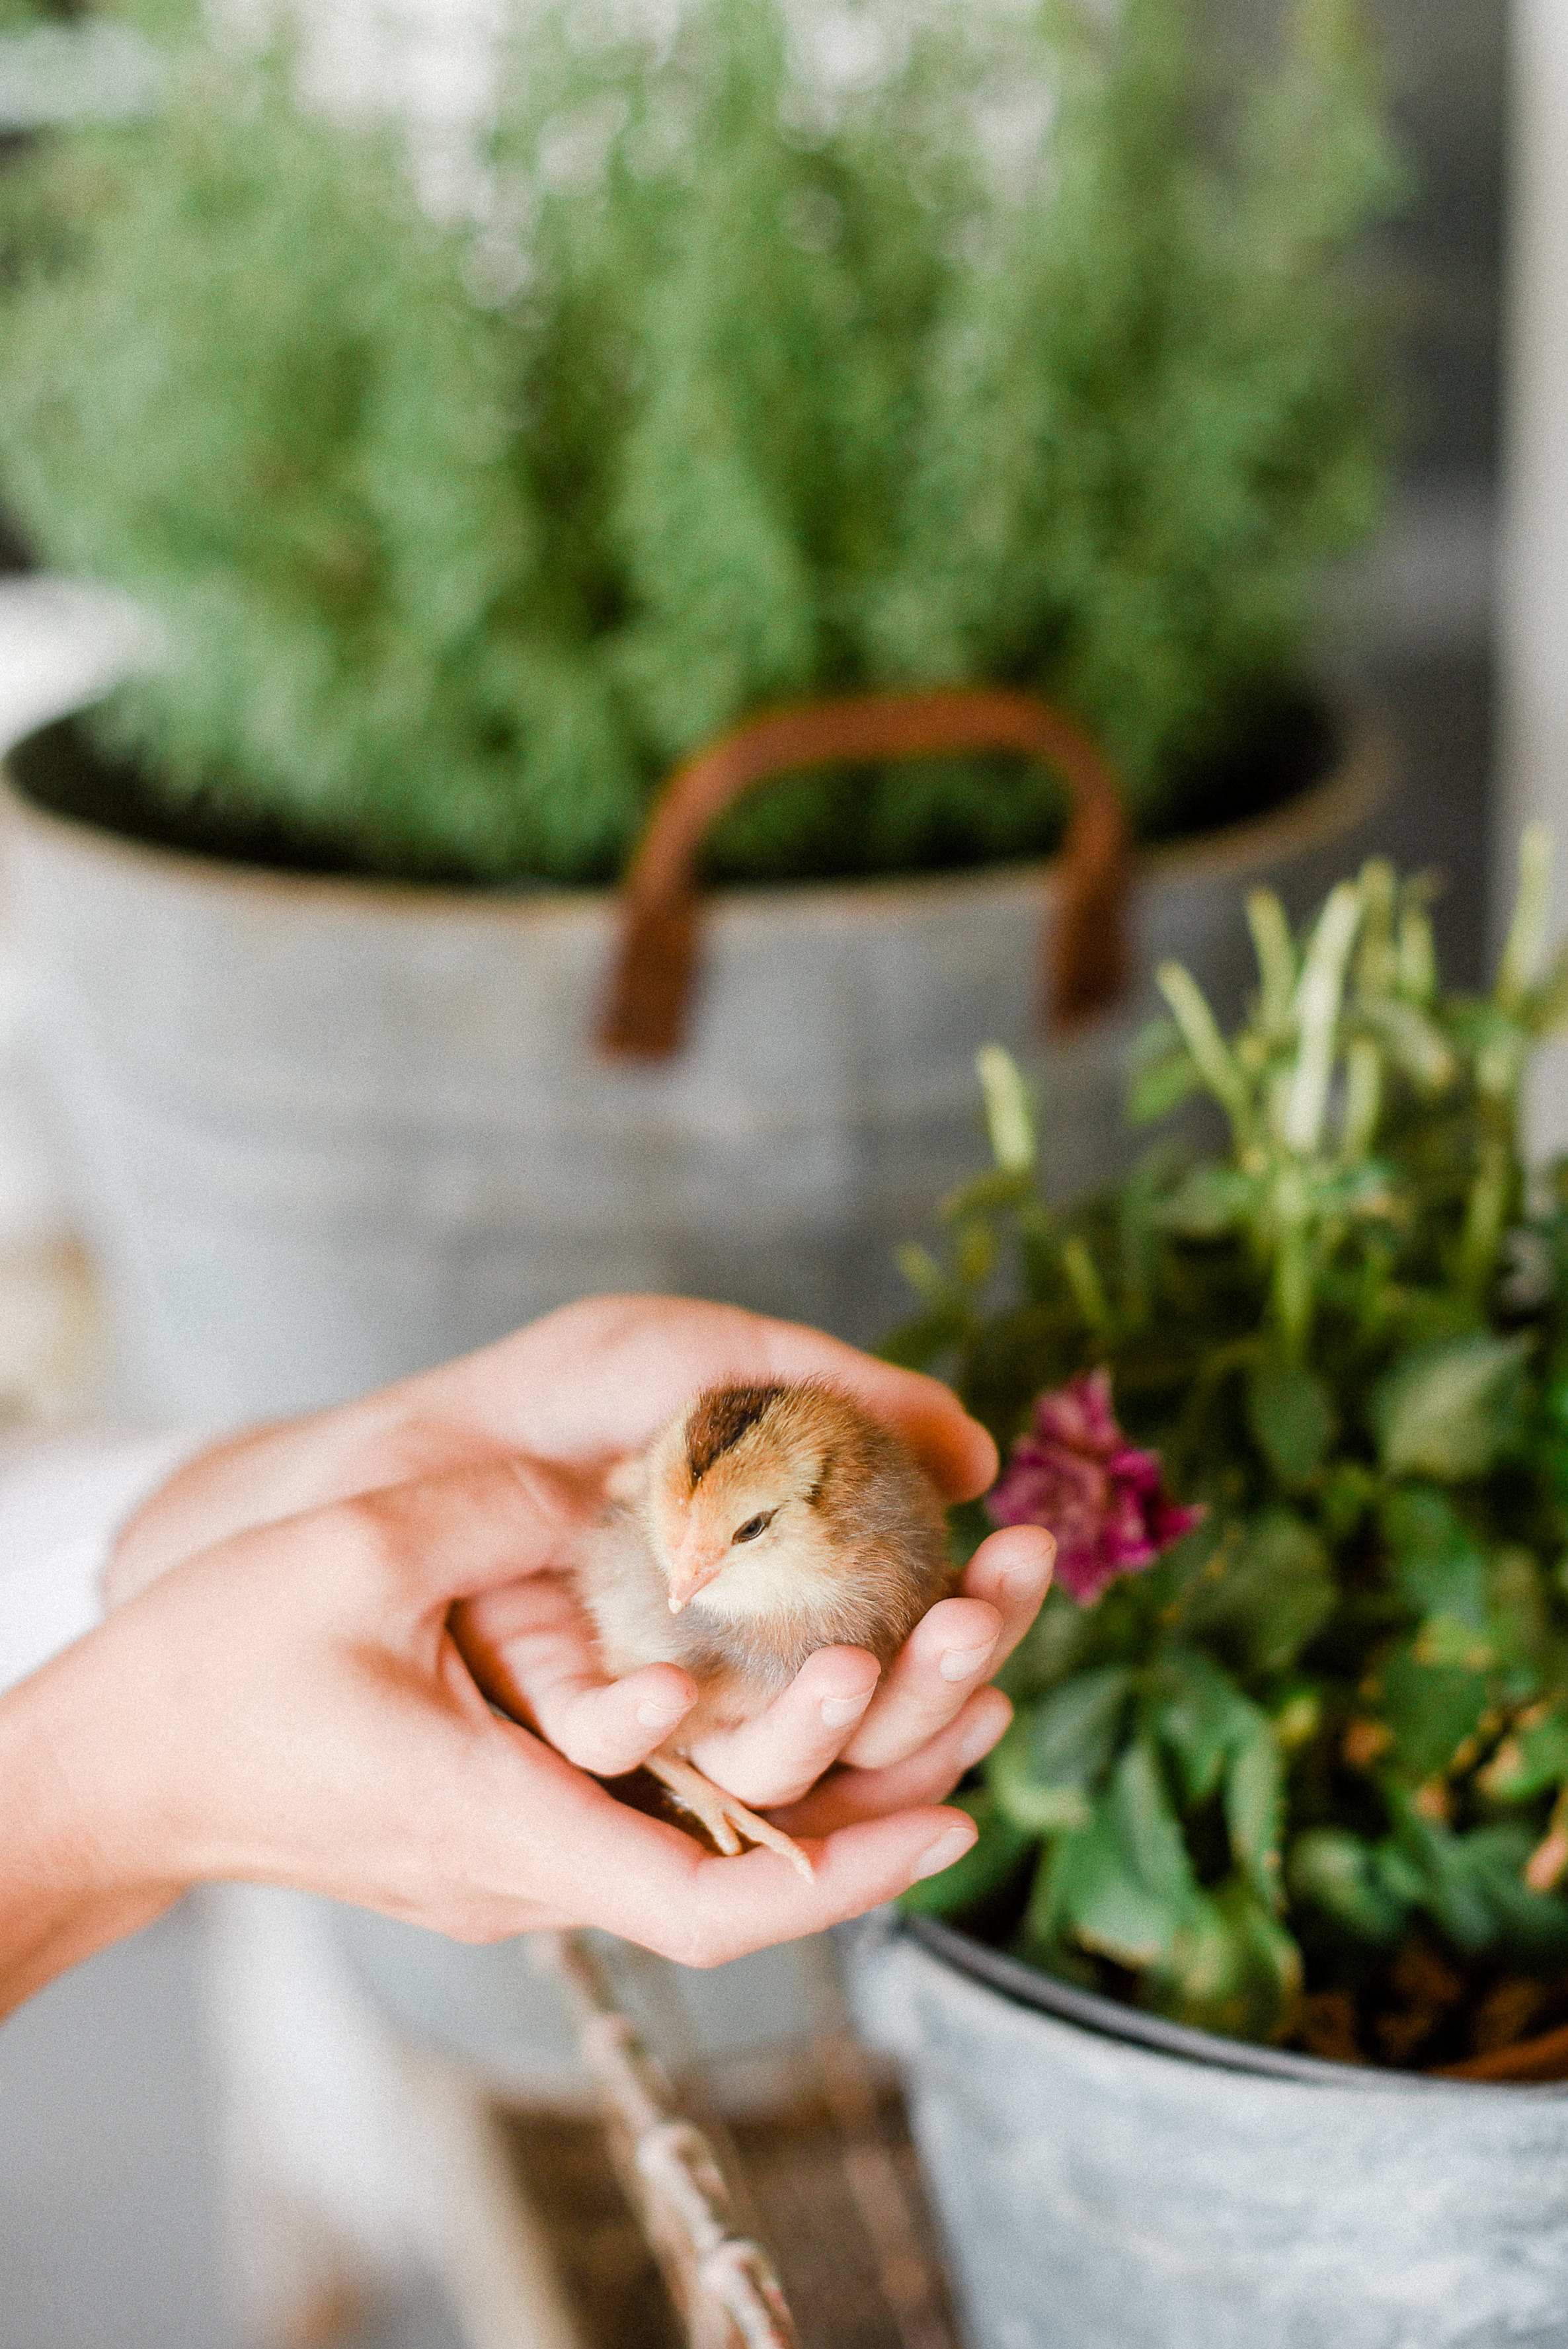 Raising chicks - tips for keeping backyard chickens boxwoodavenue.com